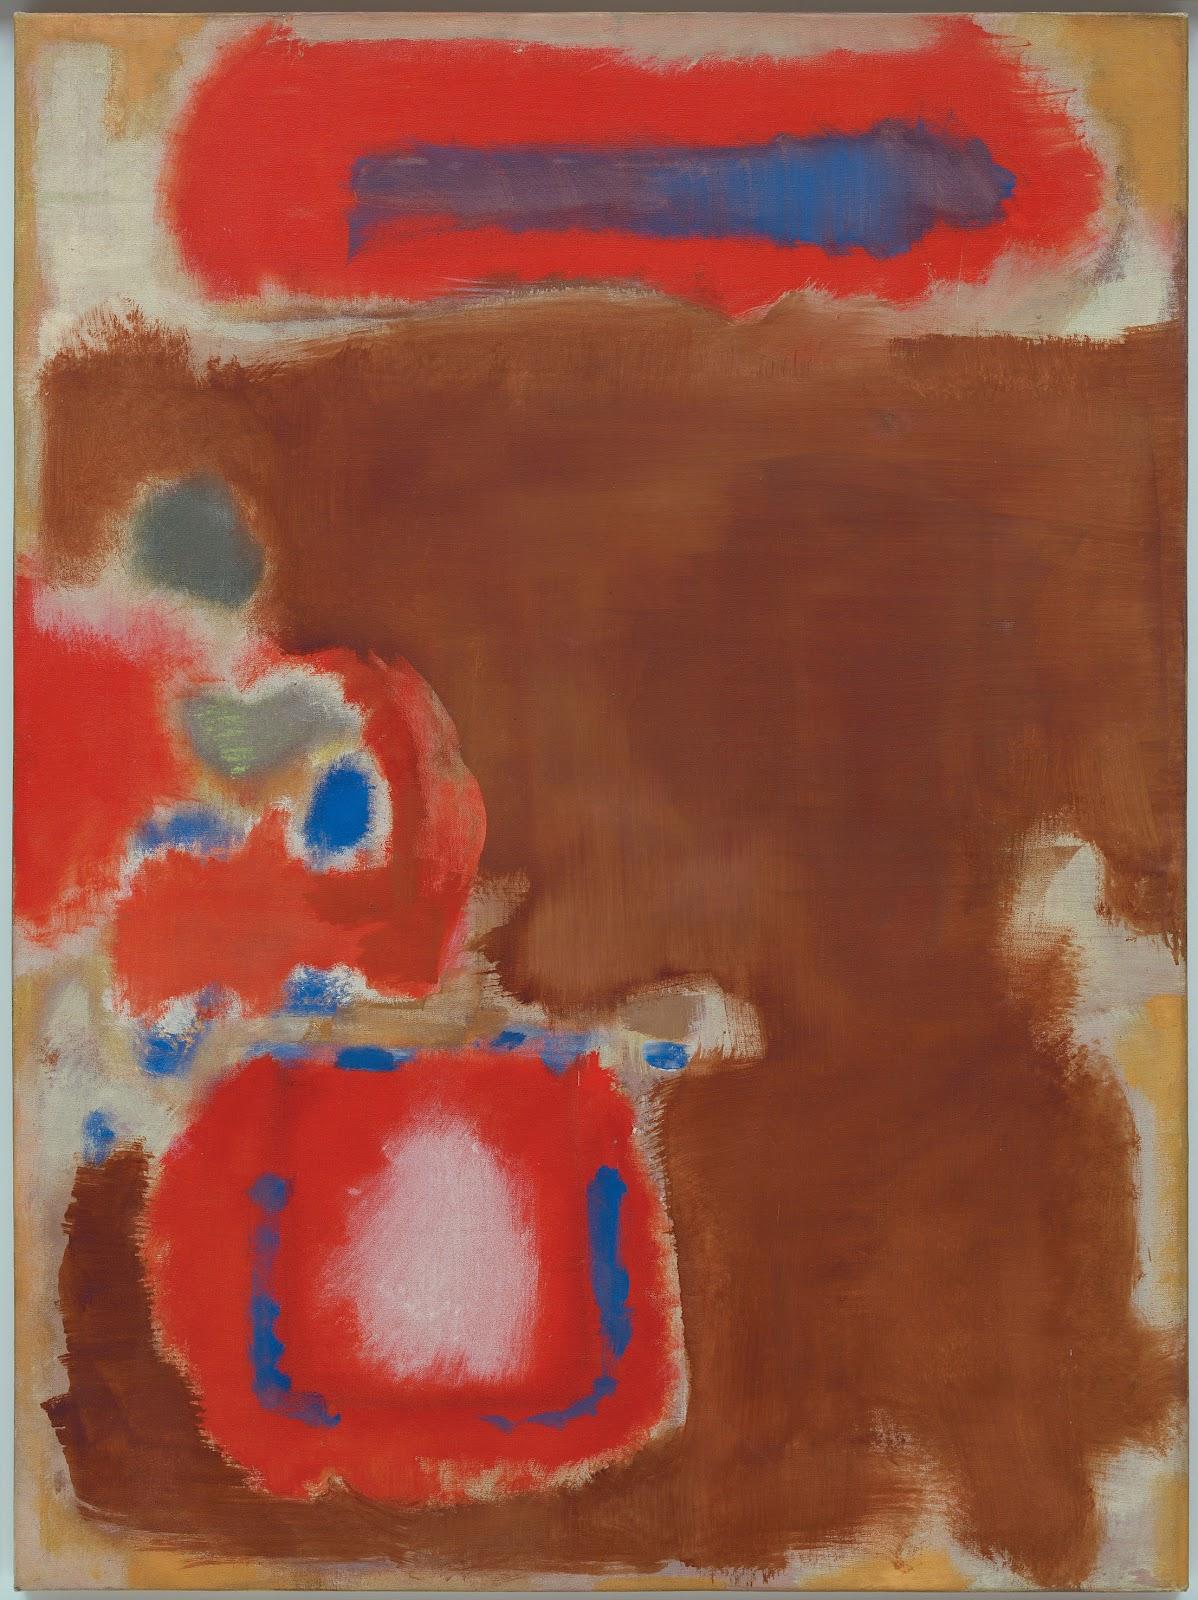 Untitled,  Mark Rothko, 1947. Solomon R Guggenheim Museum, New York